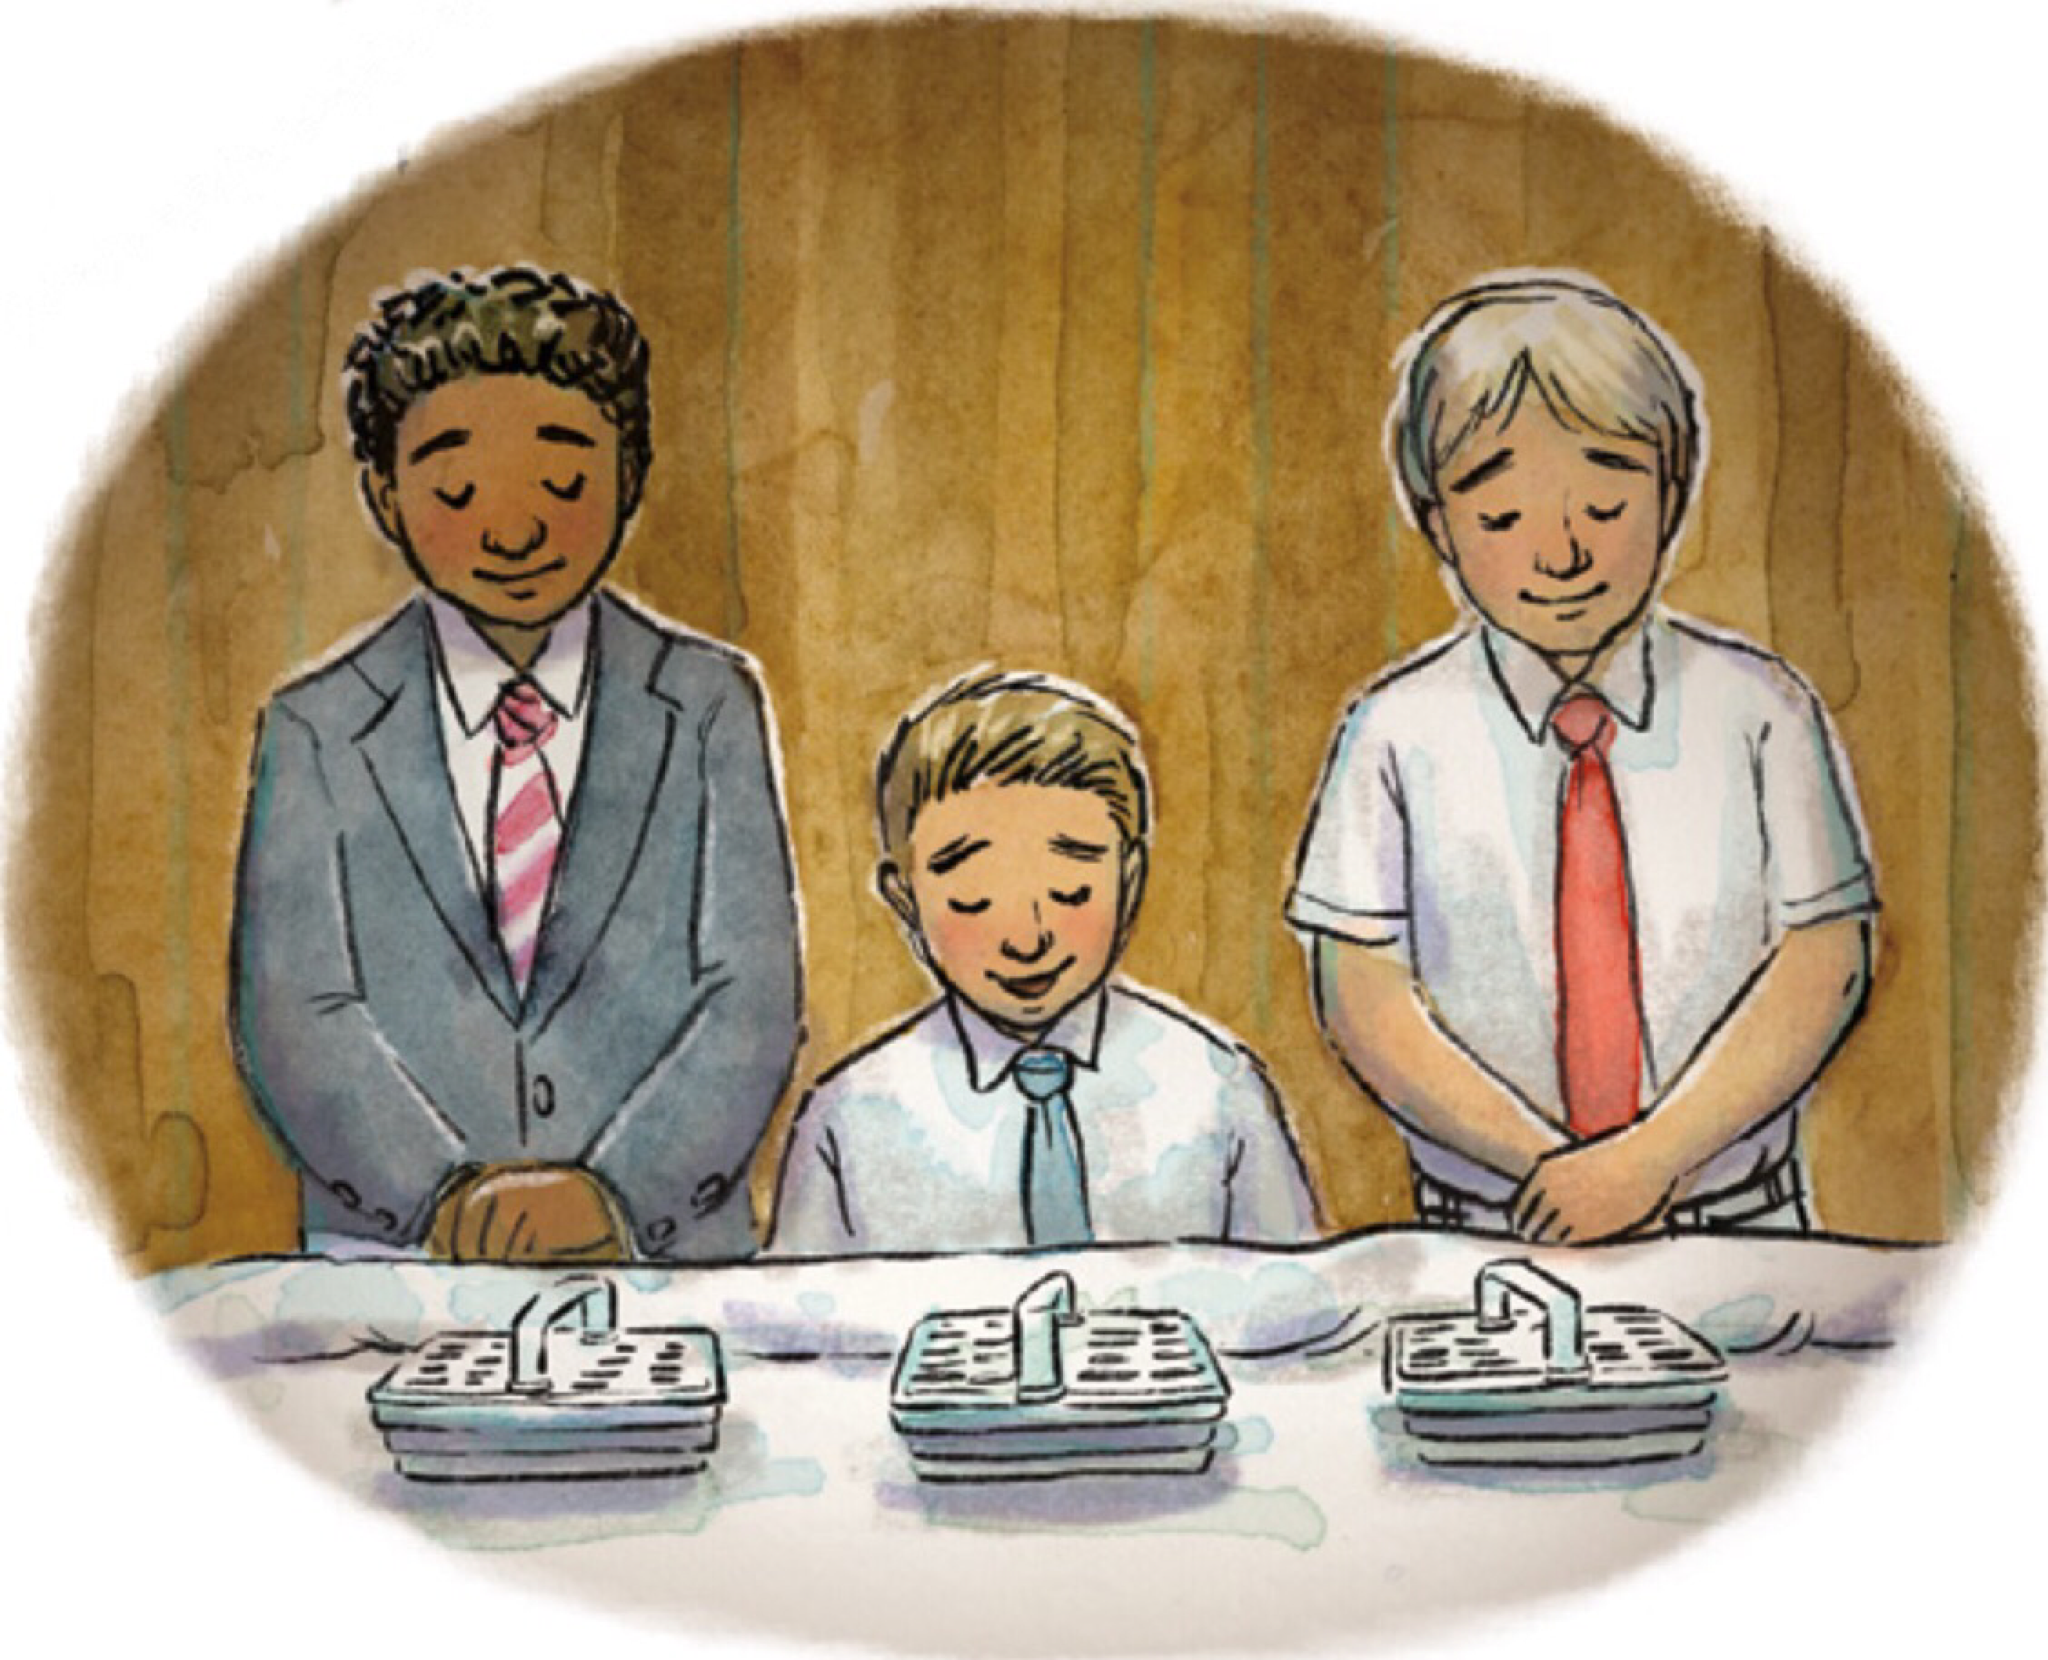 Sacramental covenamnts lds clipart svg library stock Sacrament: Clipart - Teaching Children svg library stock